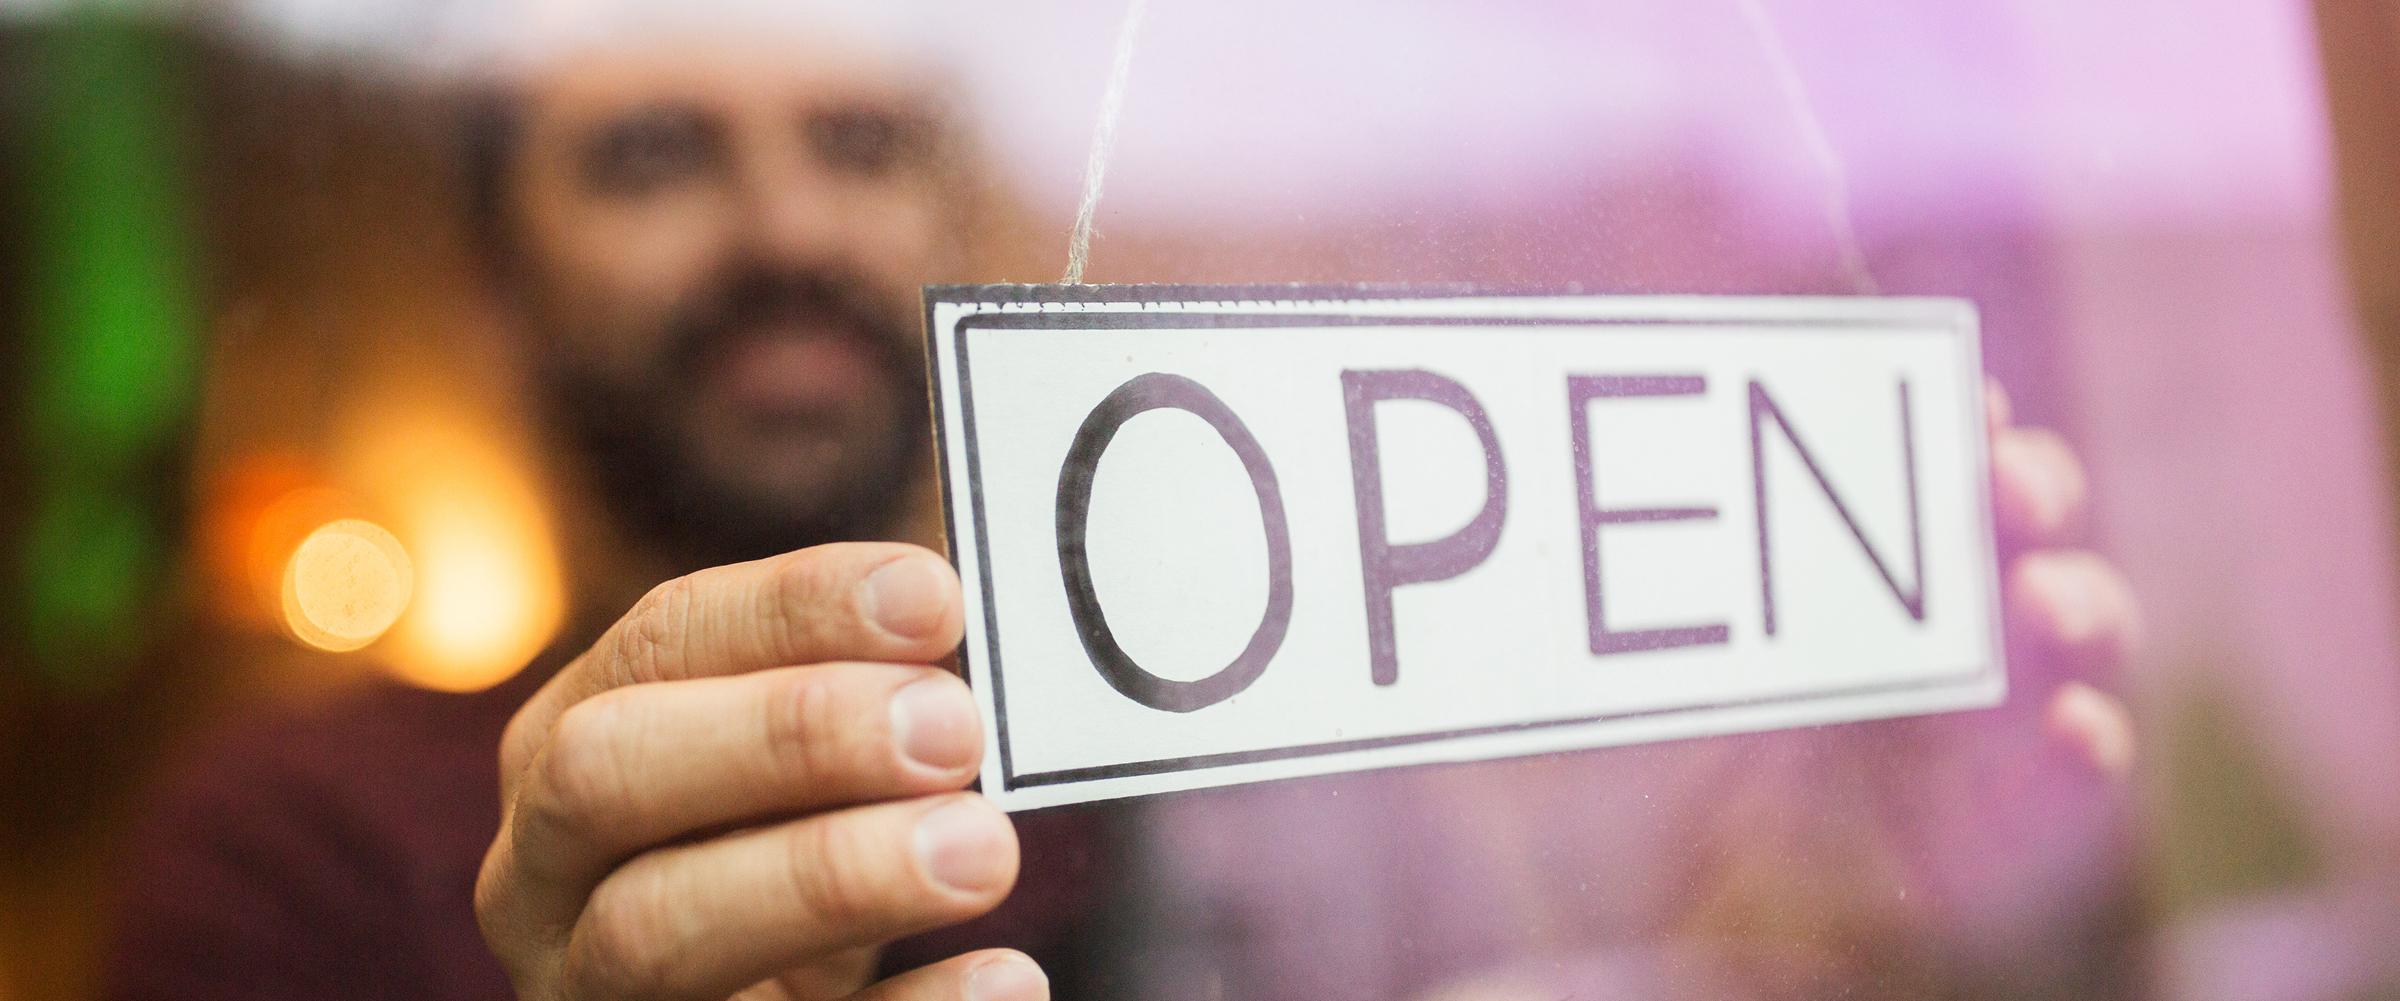 OpenArticle